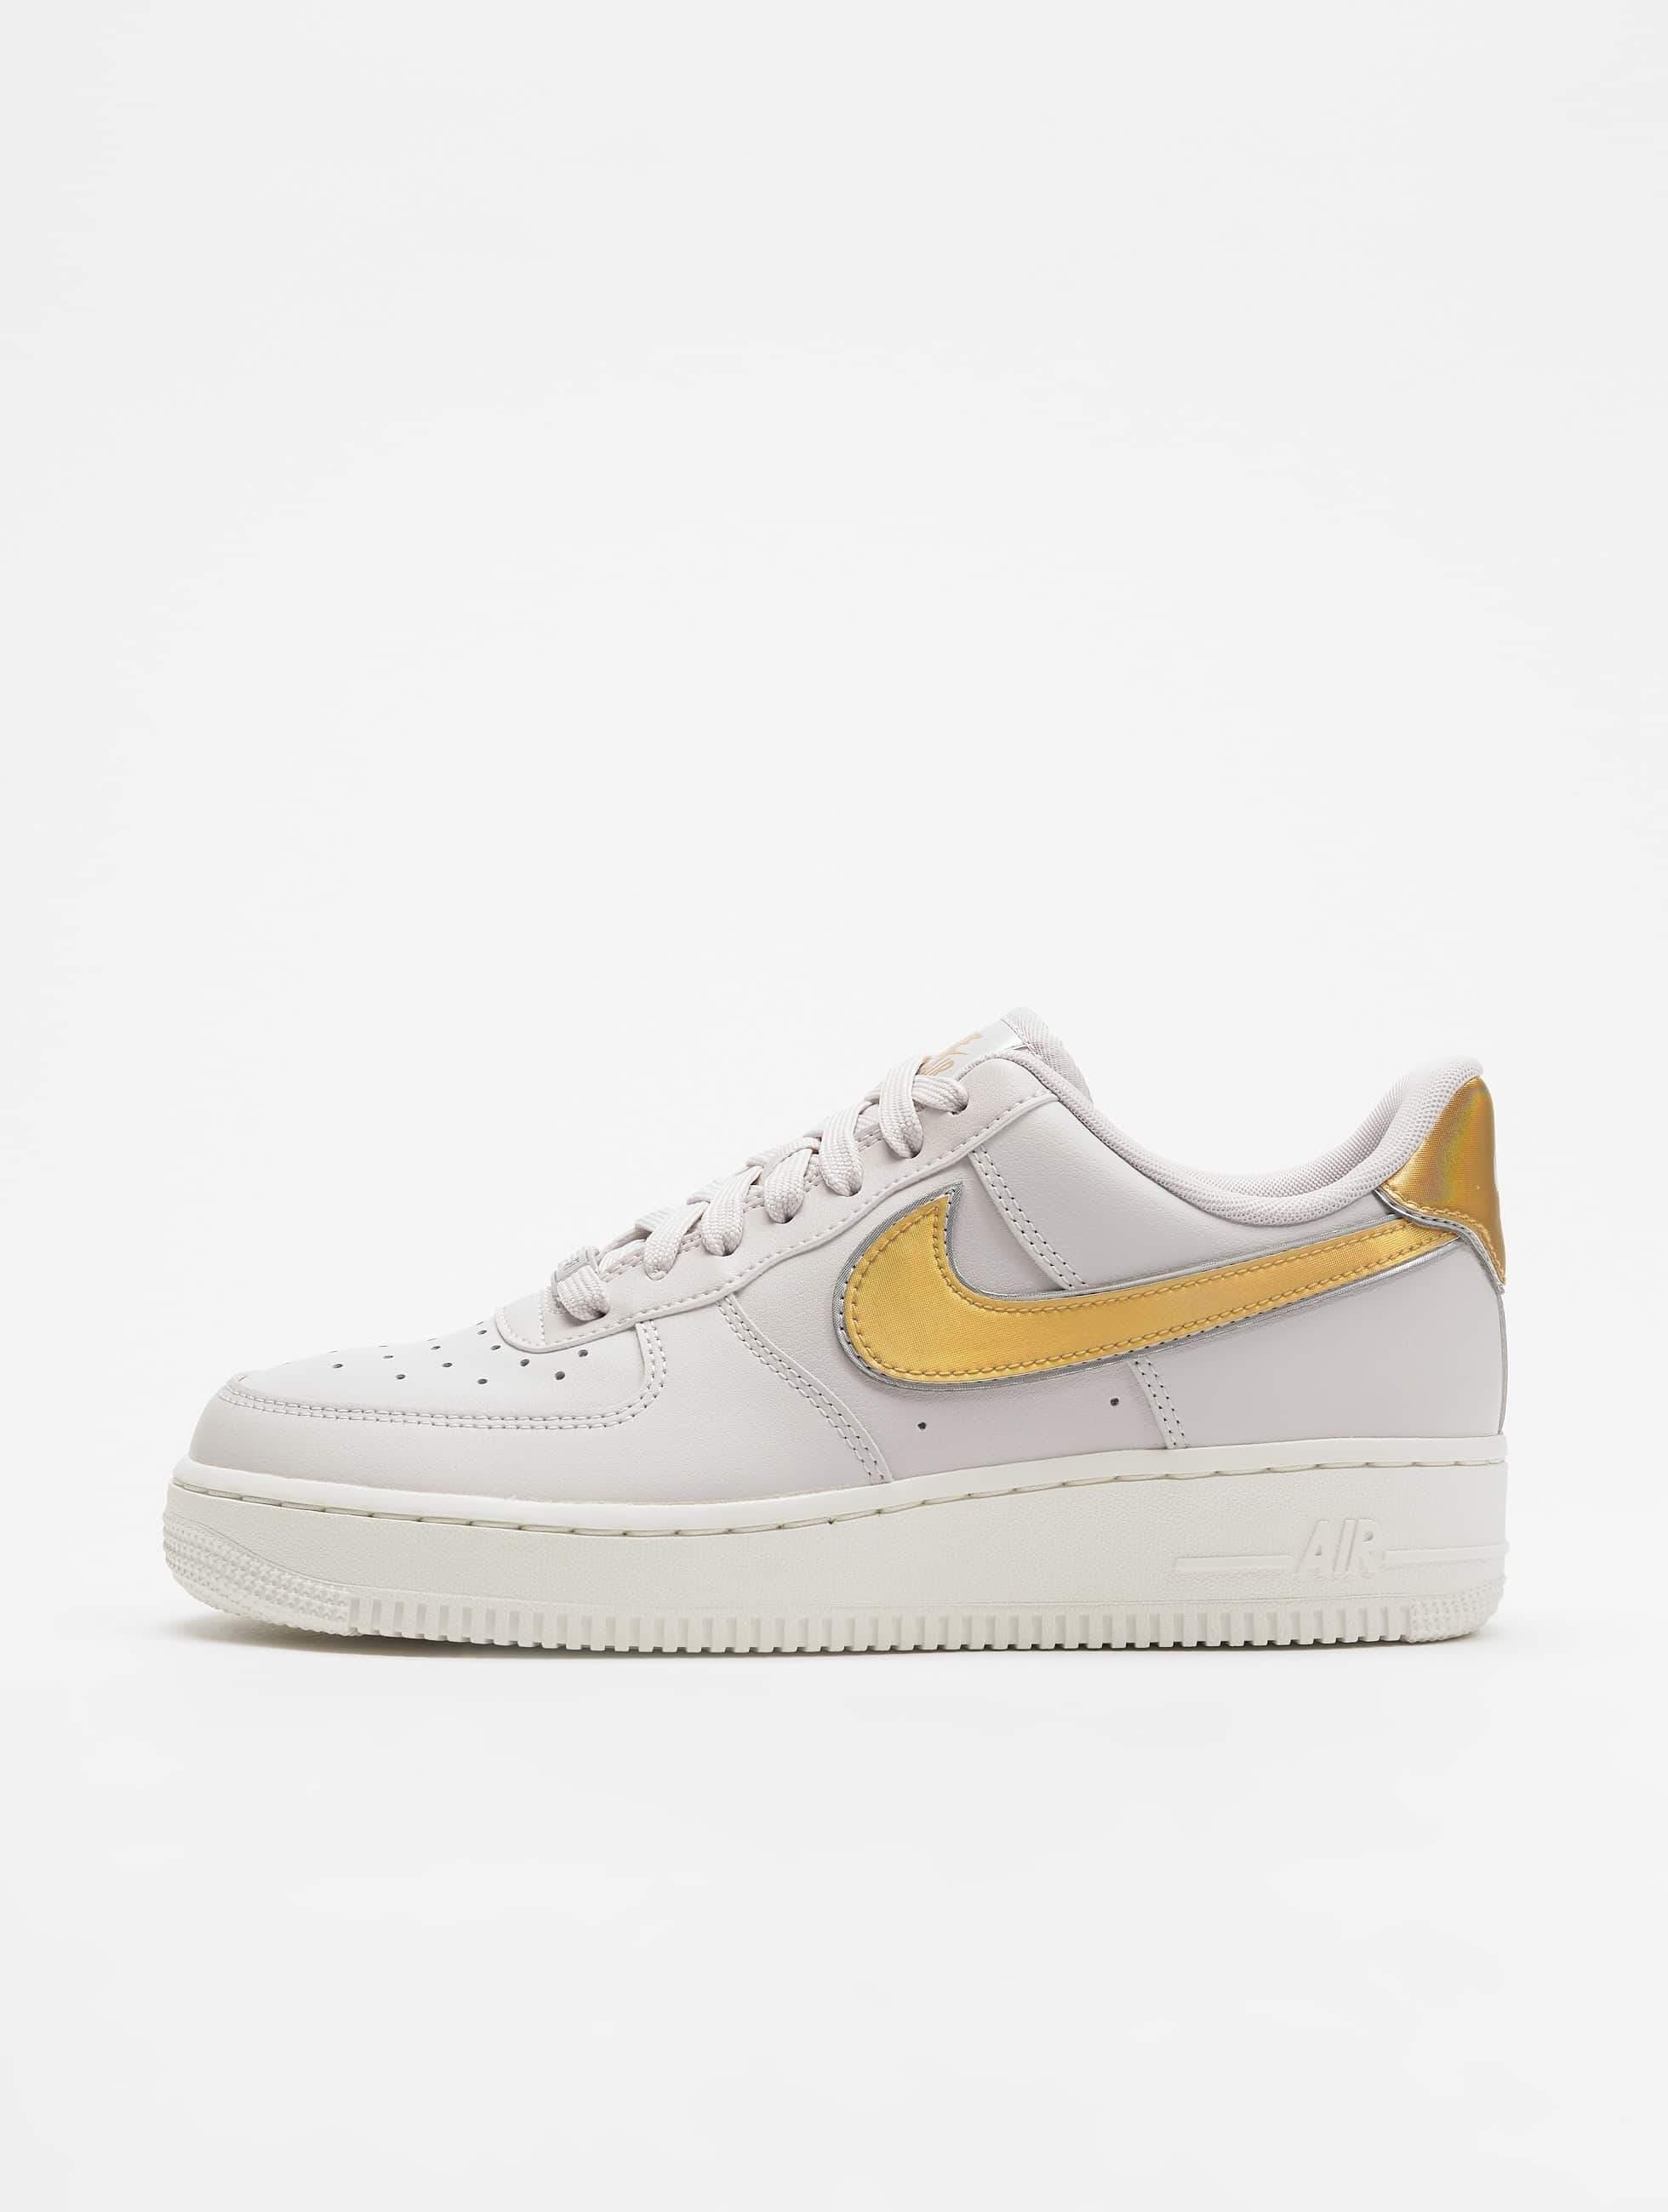 1664accf463 Nike schoen / sneaker Air Force 1 07 Metallic in grijs 539720